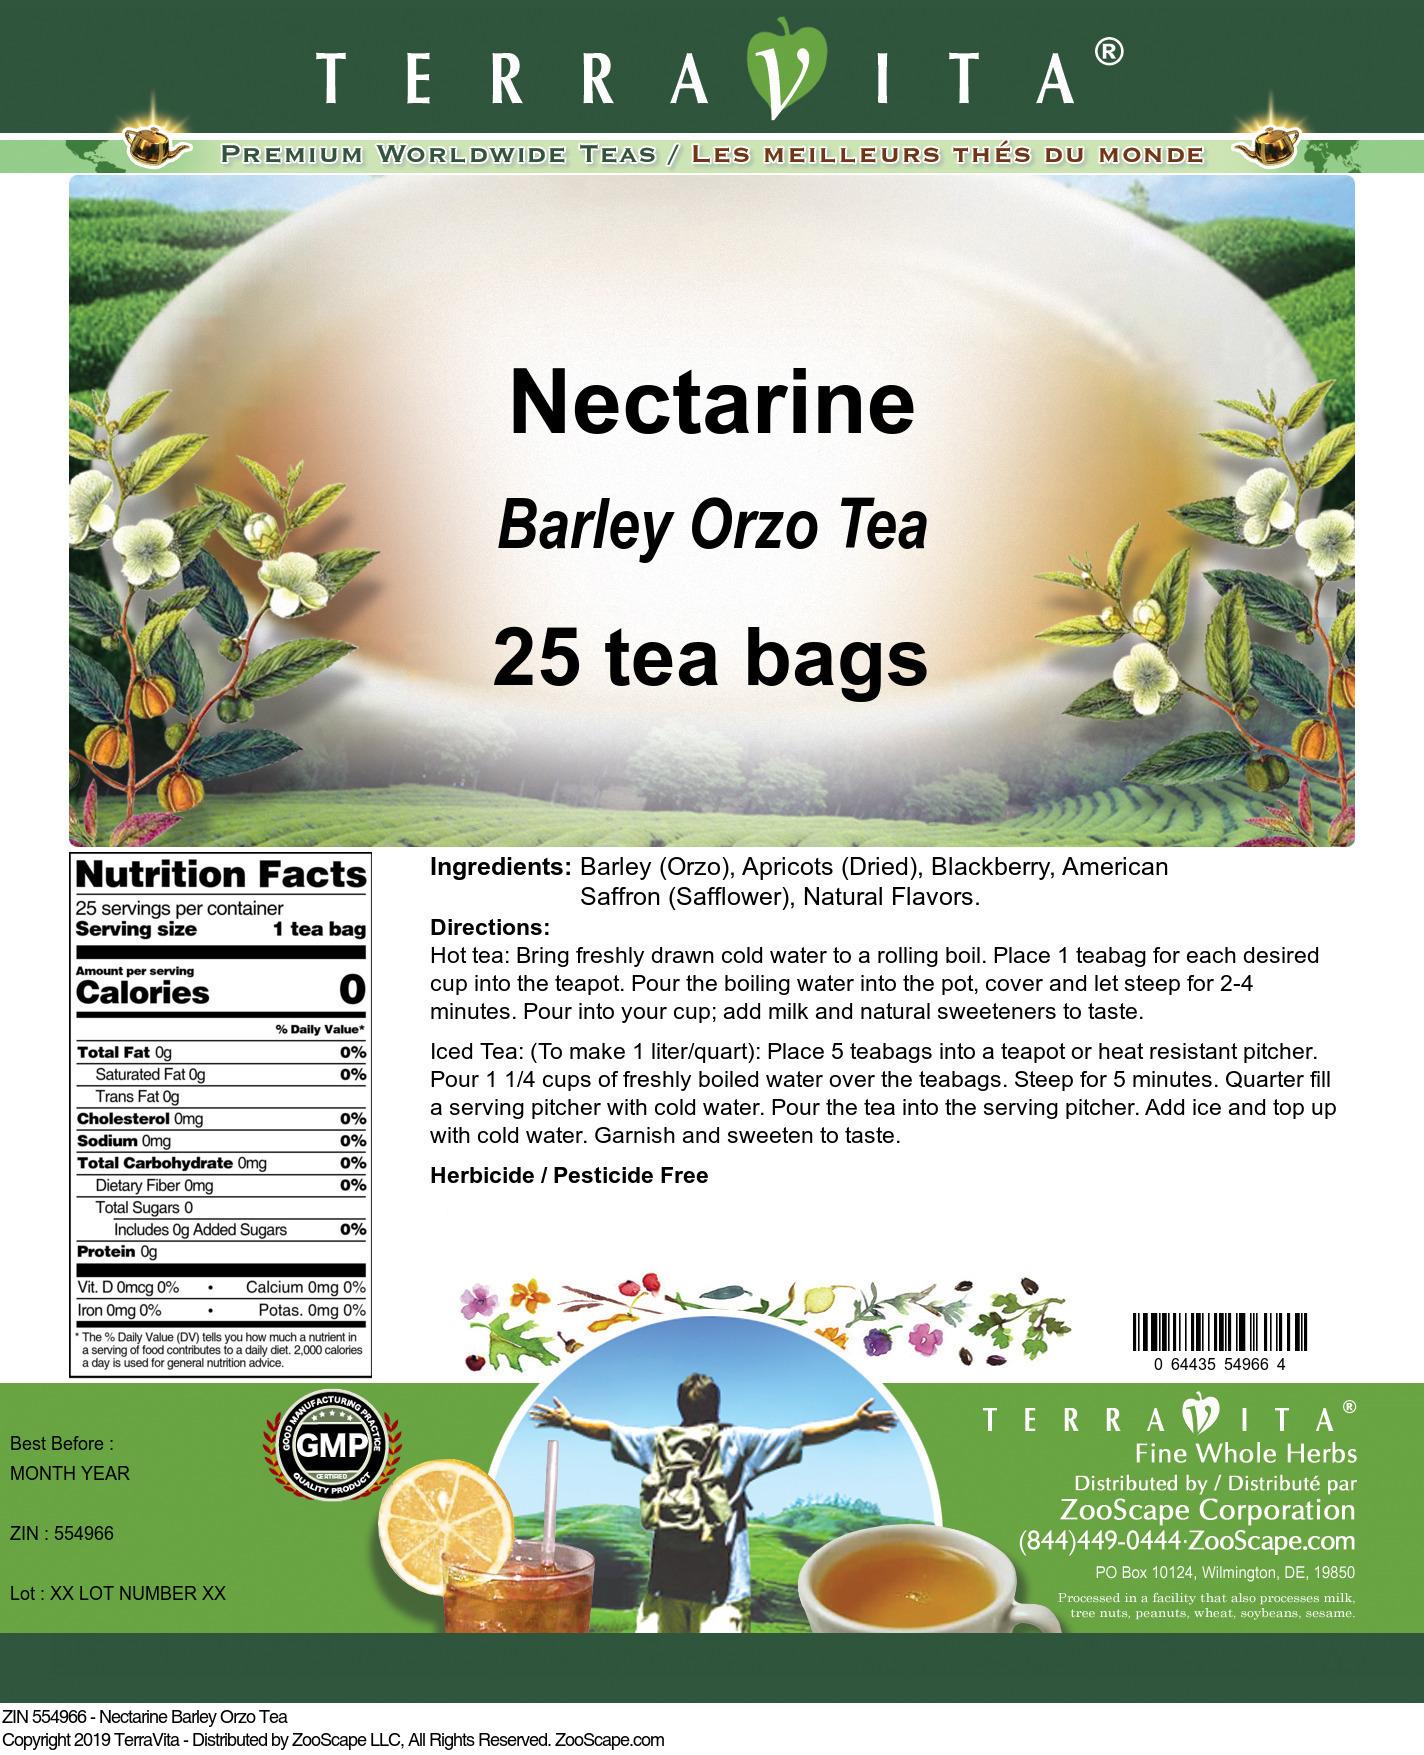 Nectarine Barley Orzo Tea